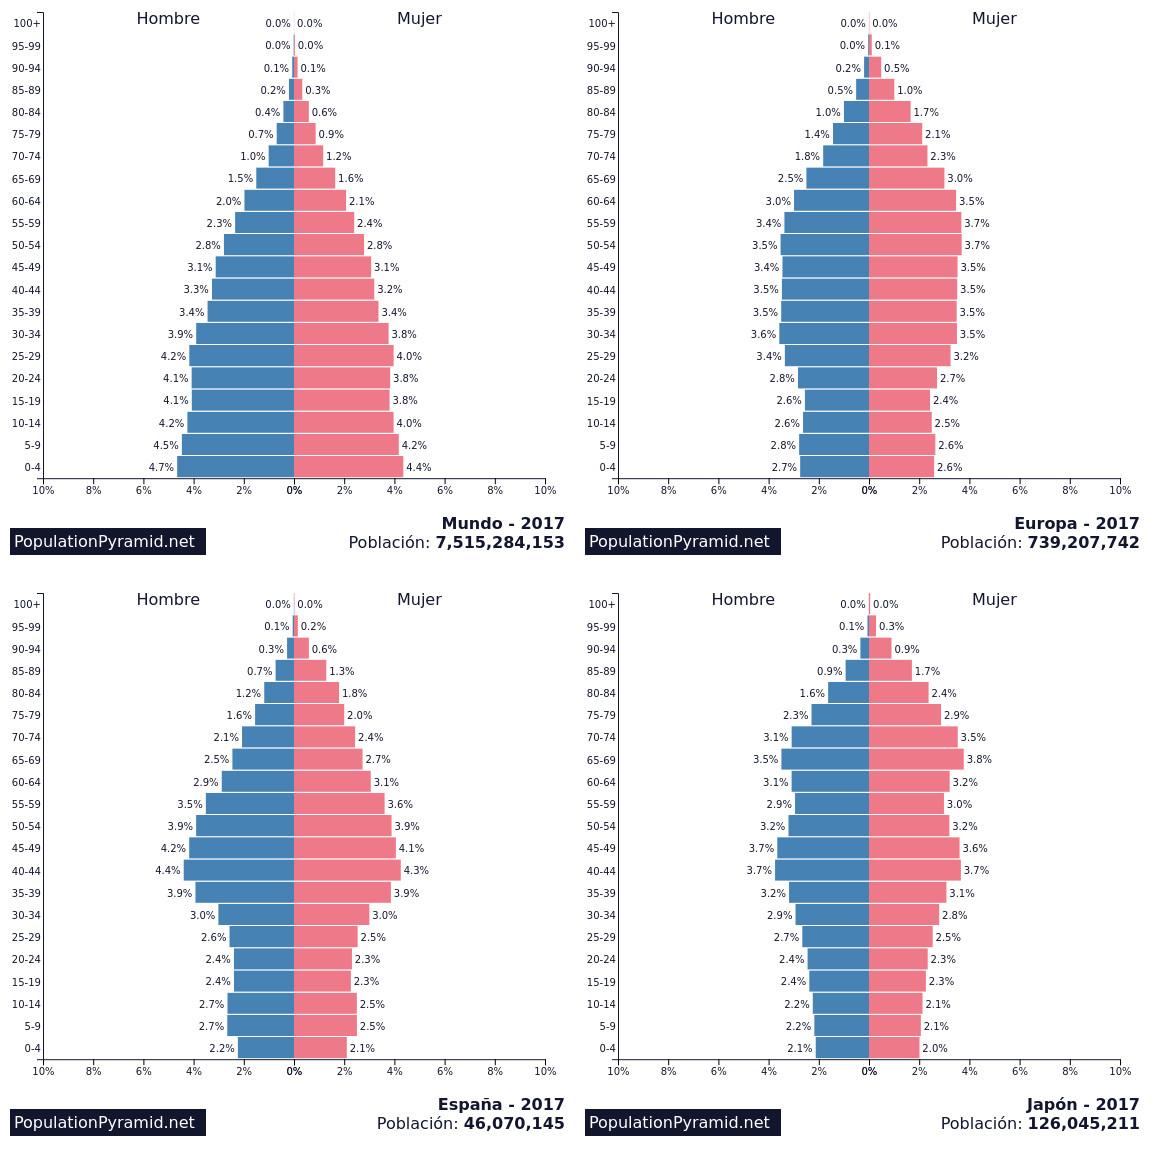 piramide poblacional inversion